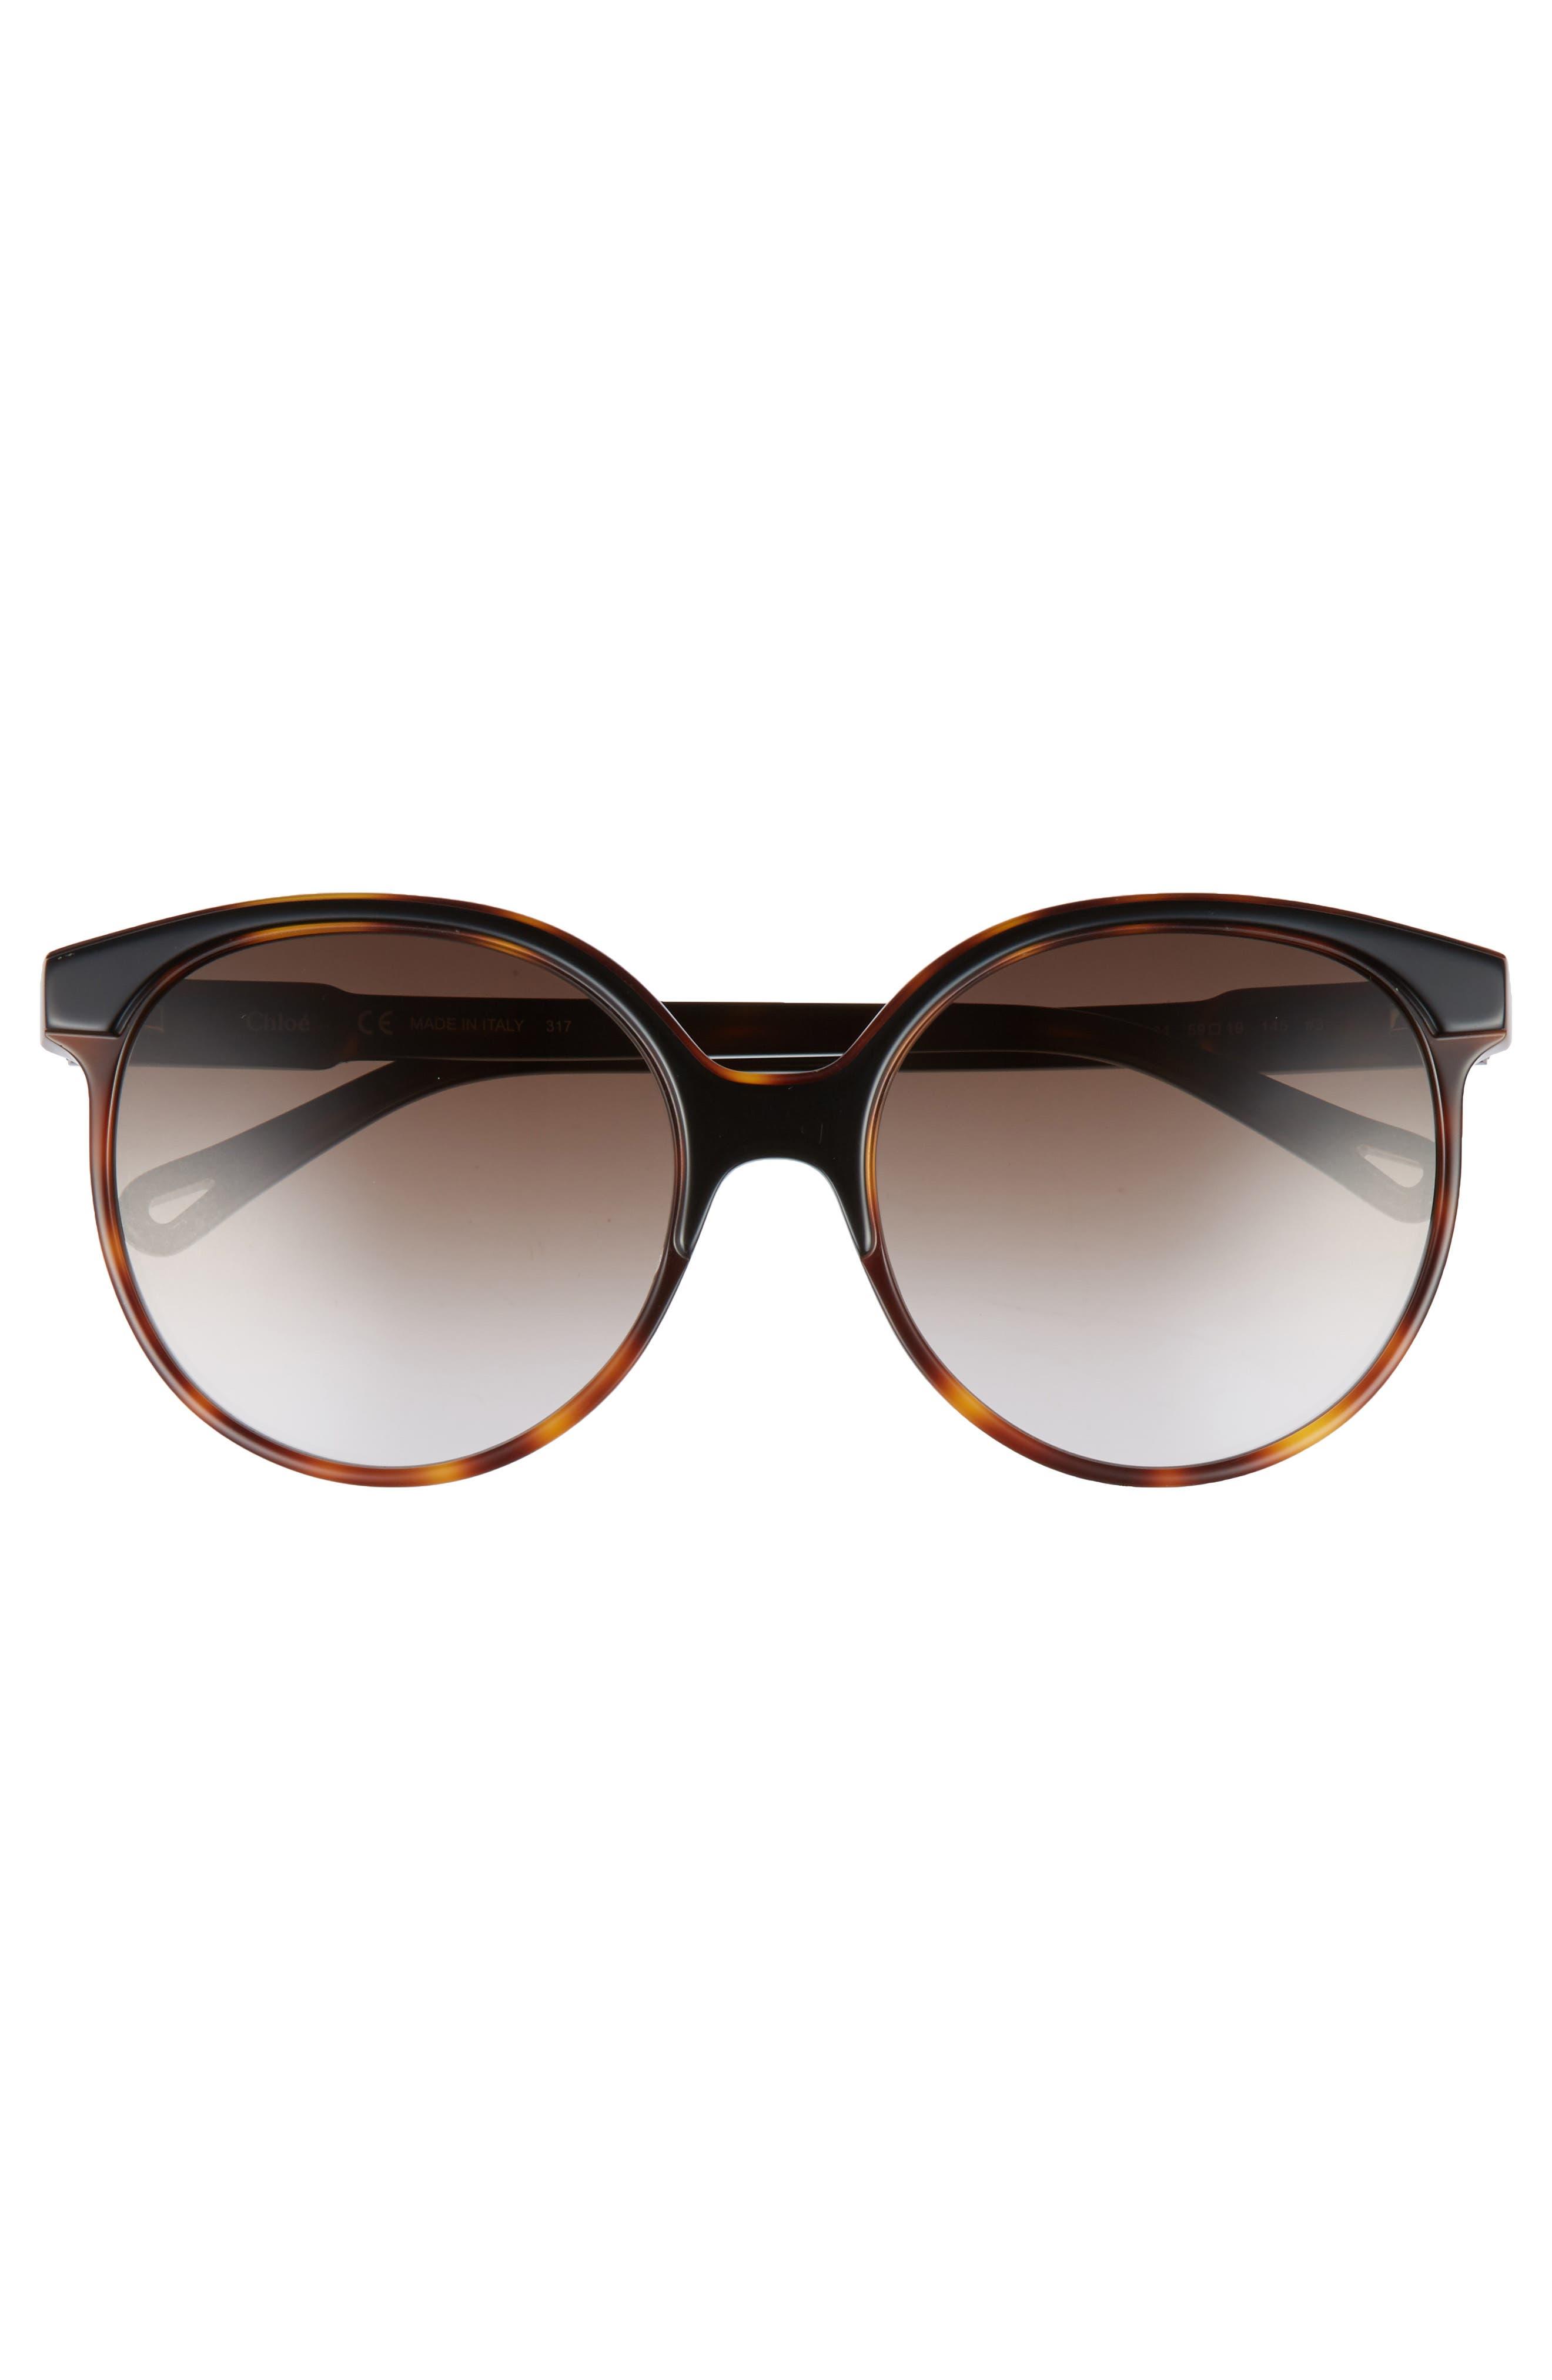 59mm Round Sunglasses,                             Alternate thumbnail 3, color,                             004